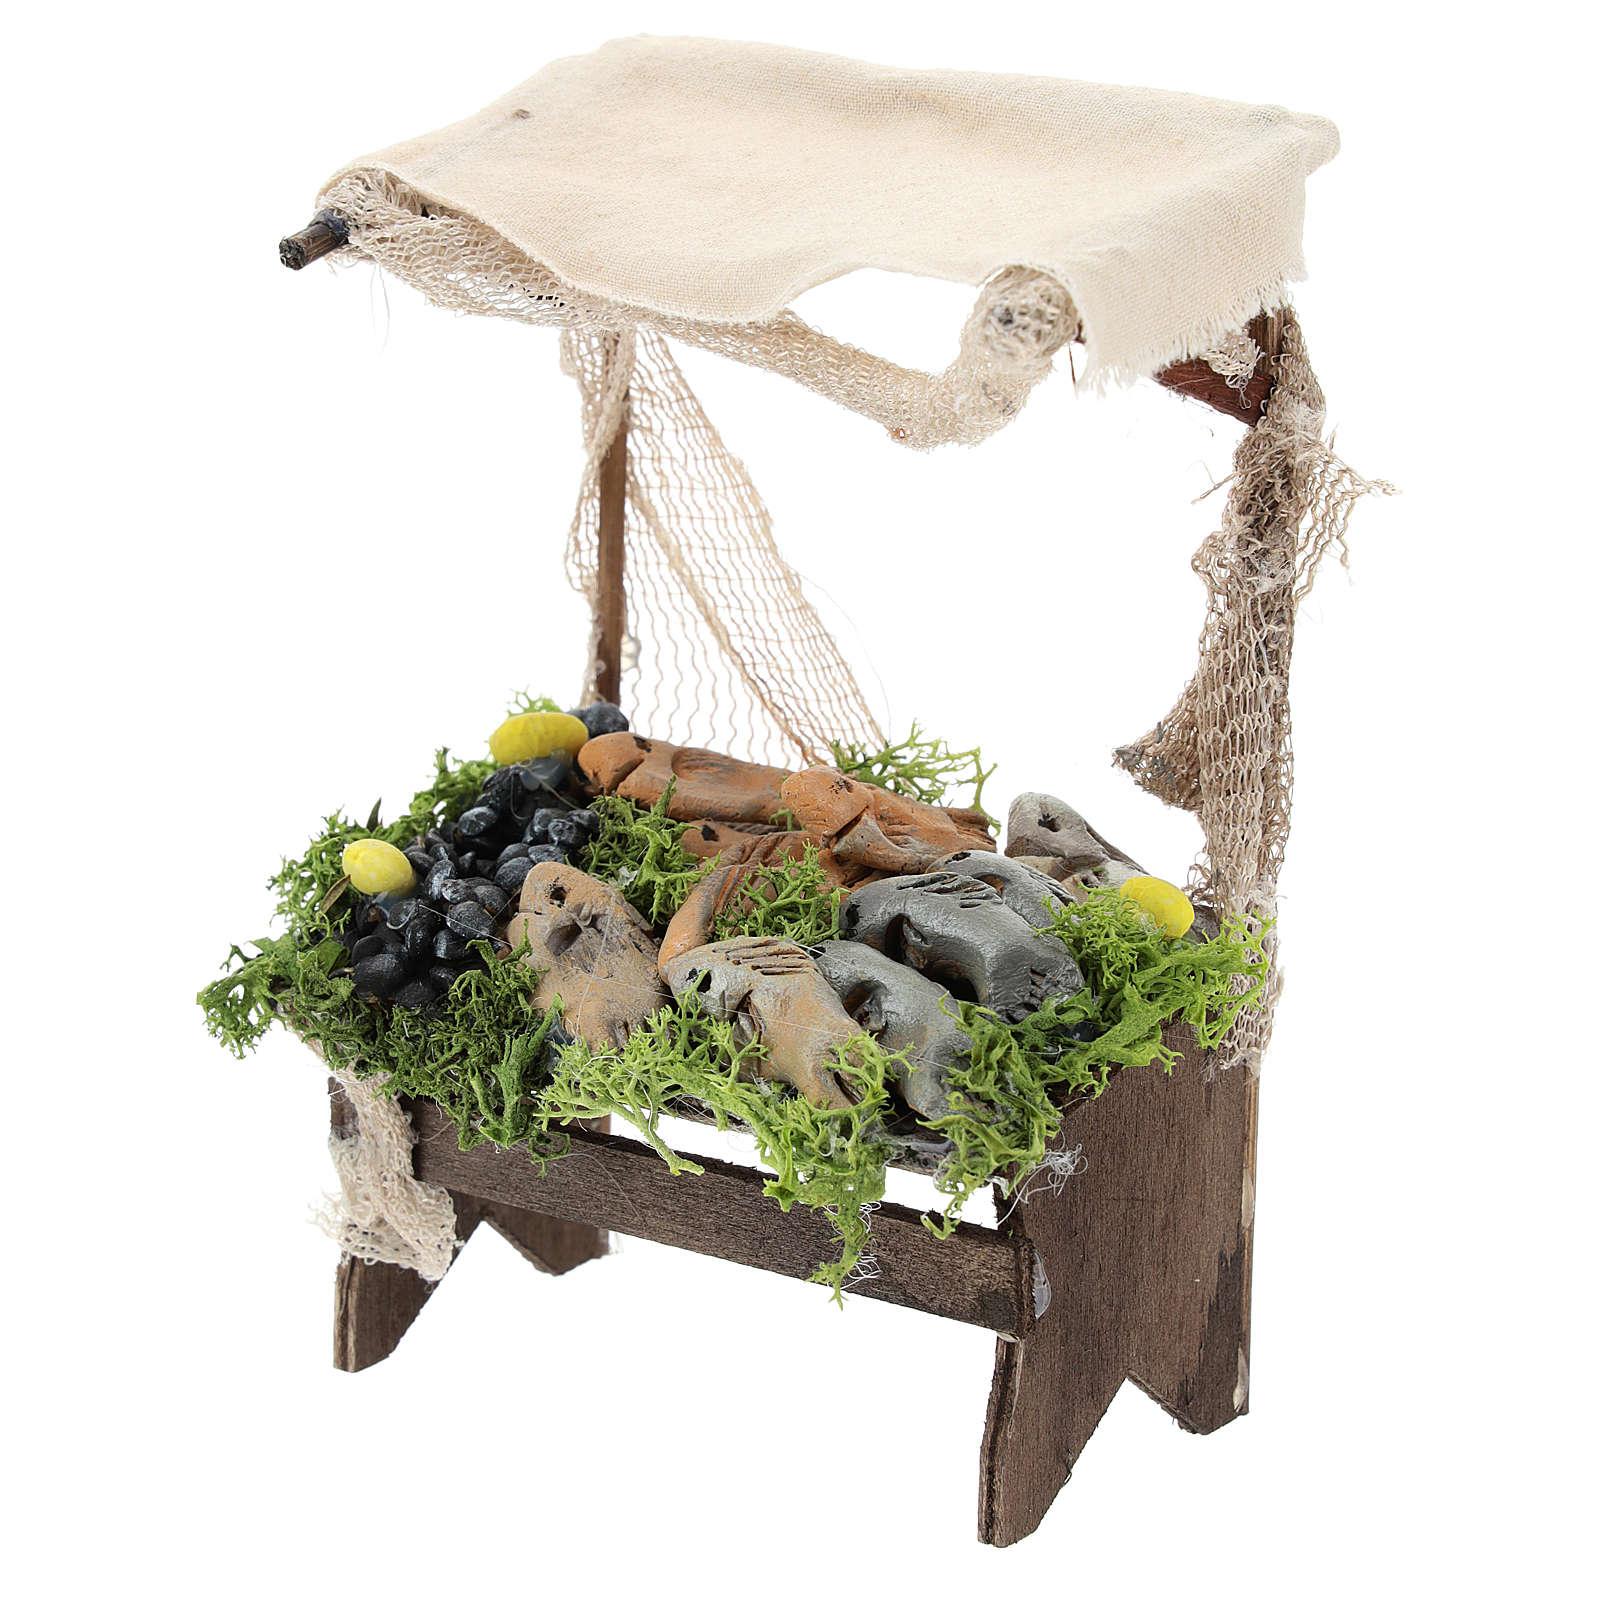 Mussel and fish stand Nativity scene 11 cm 4